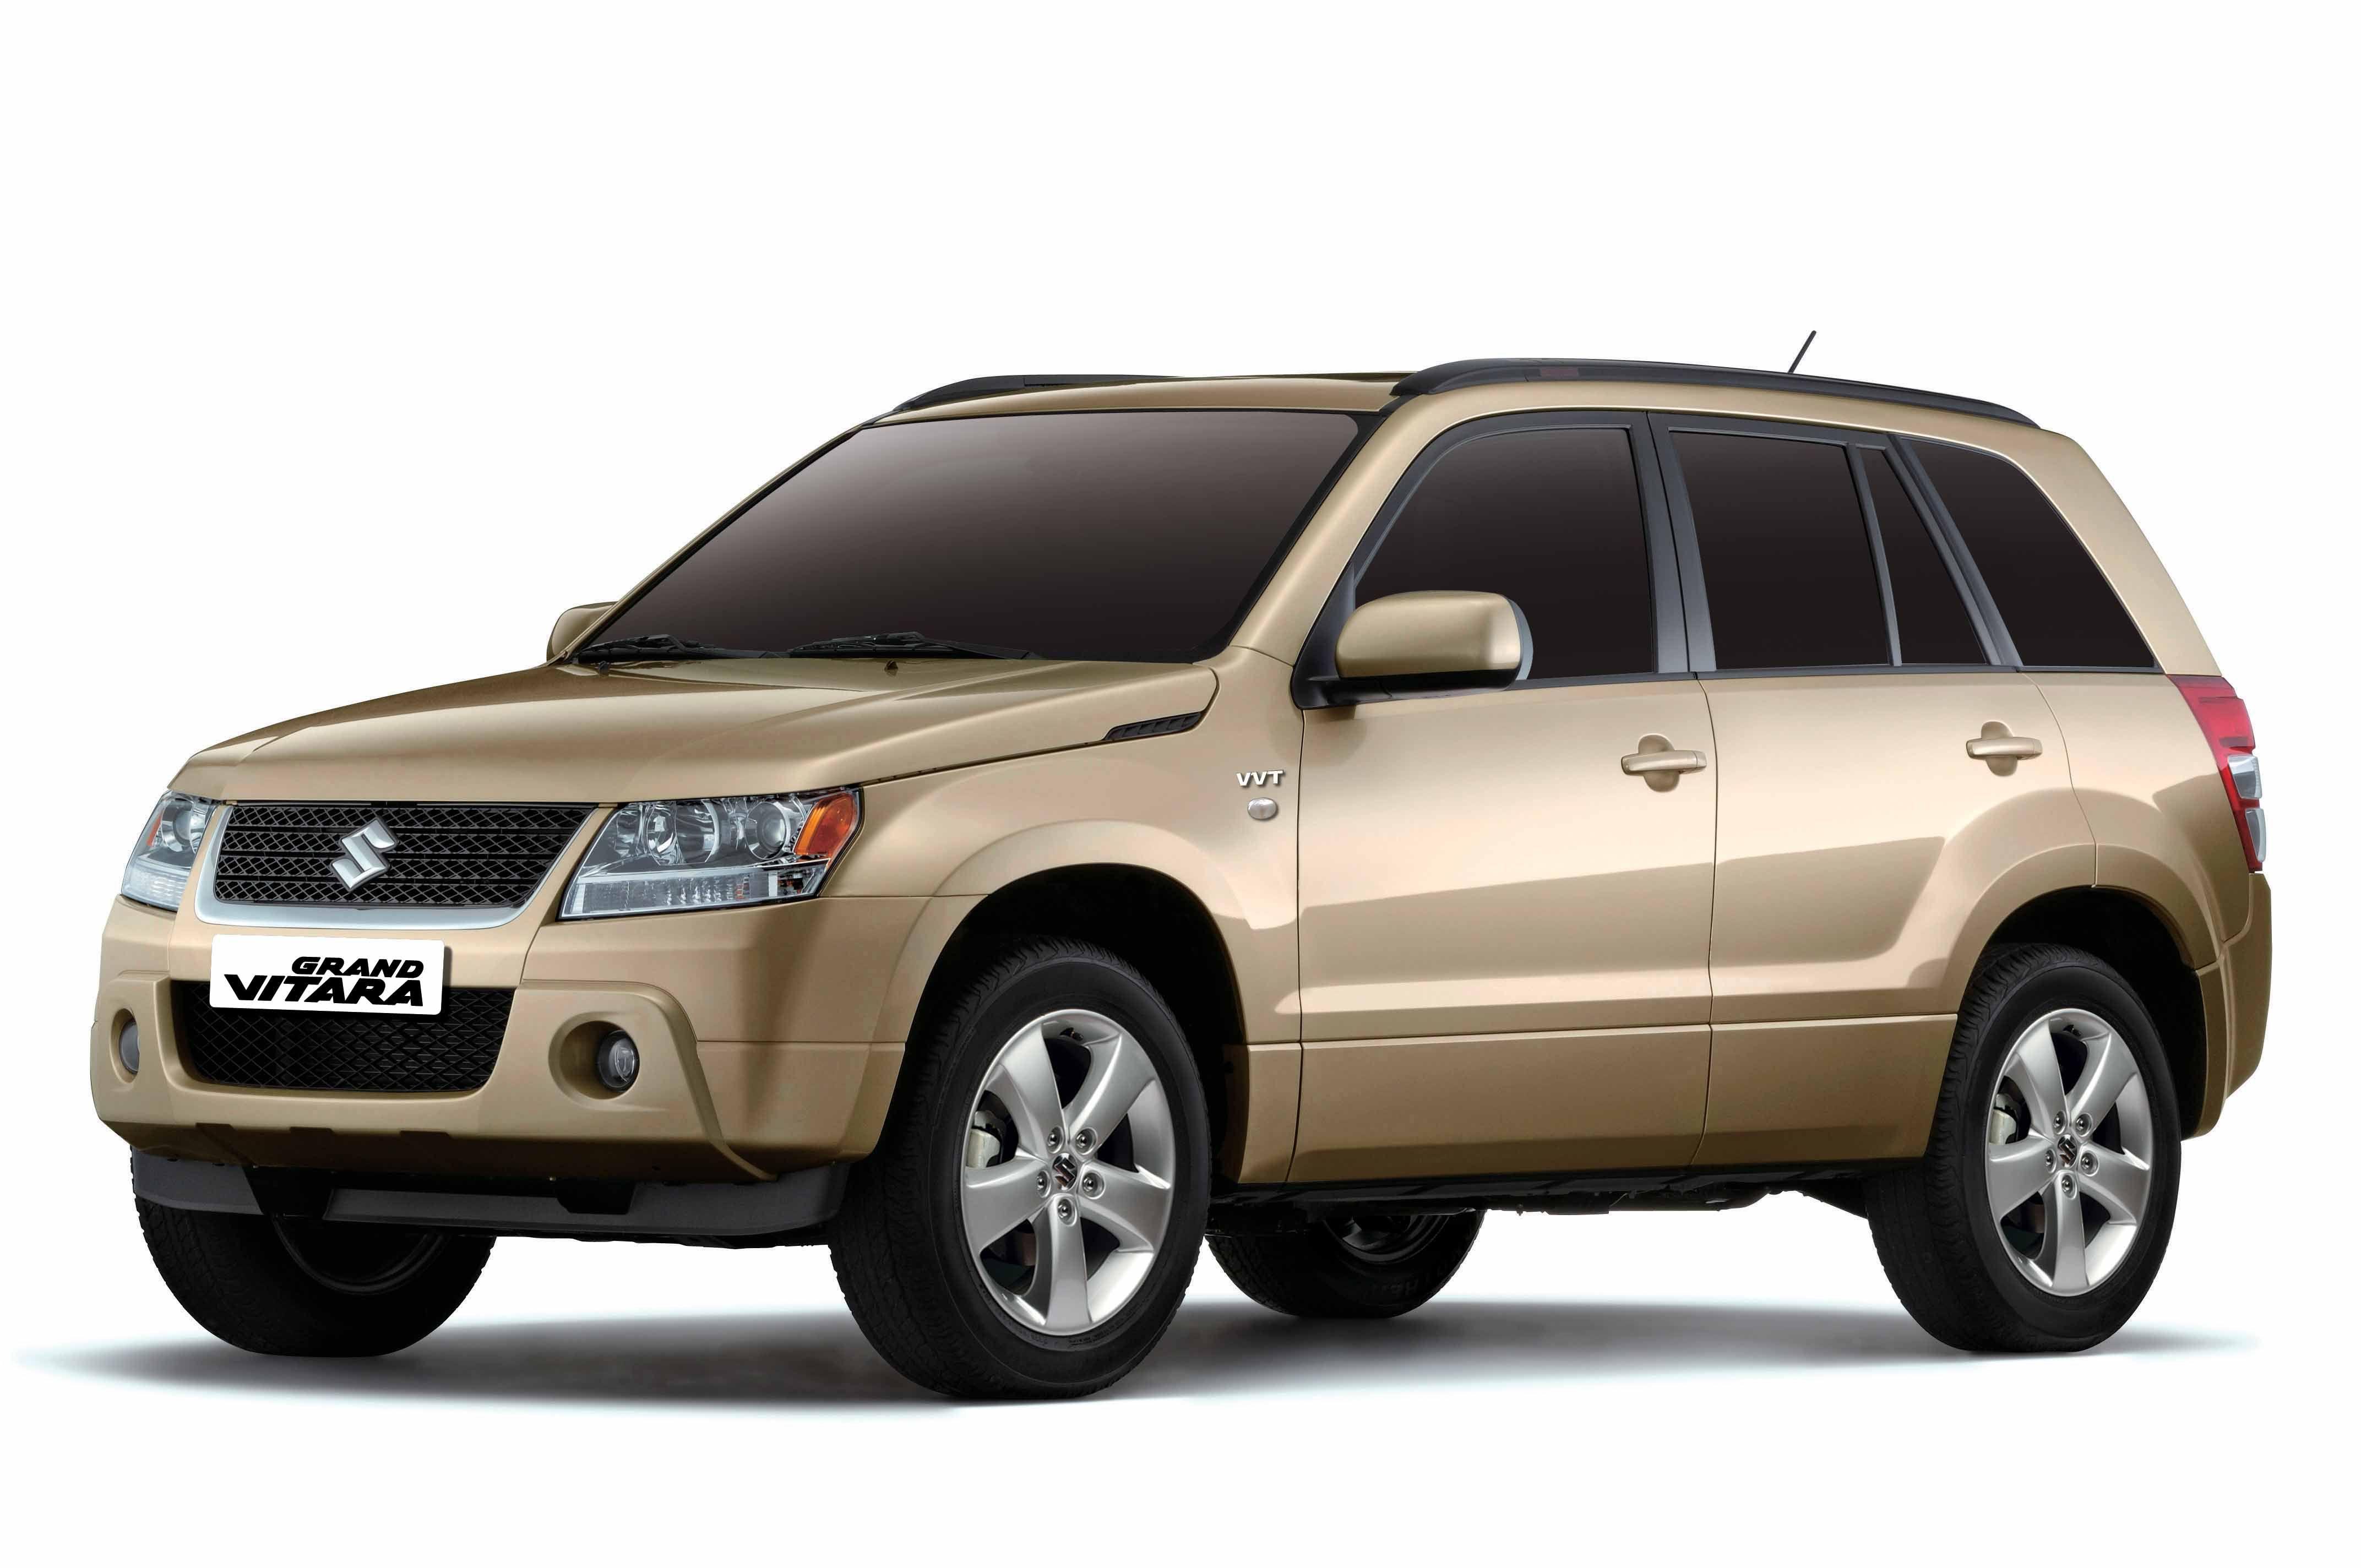 Maruti Suzuki launched the new advanced variant of its SUV